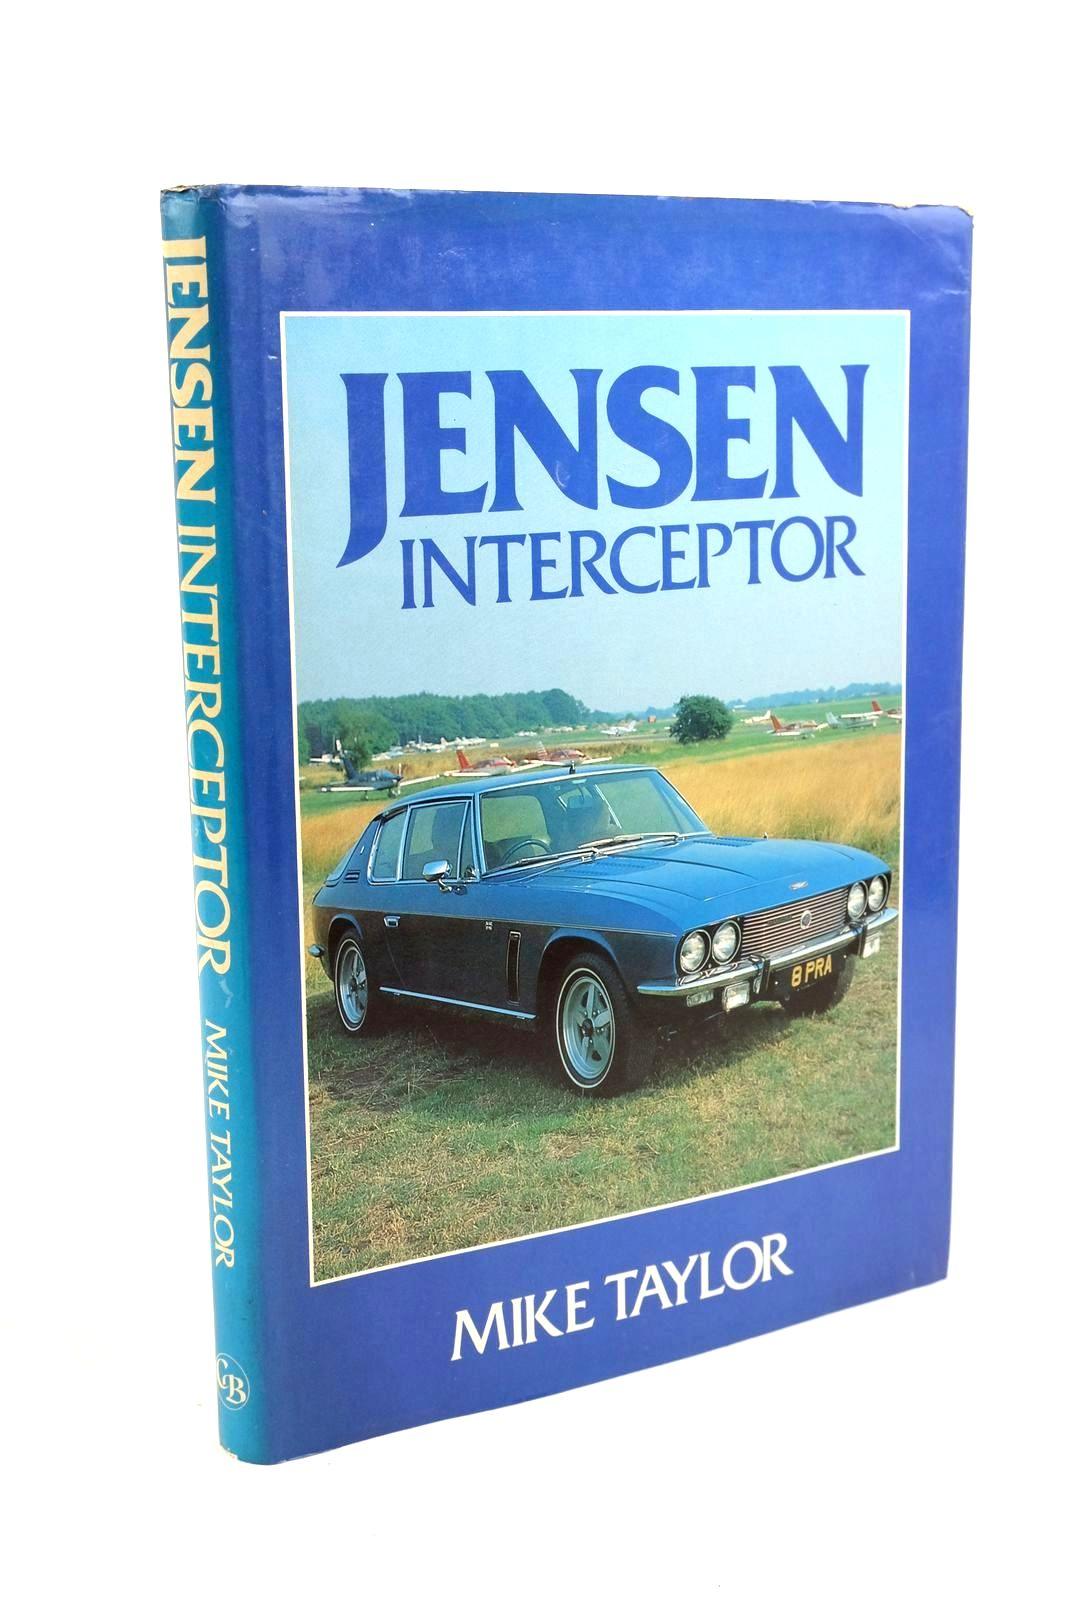 Photo of JENSEN INTERCEPTOR- Stock Number: 1321499